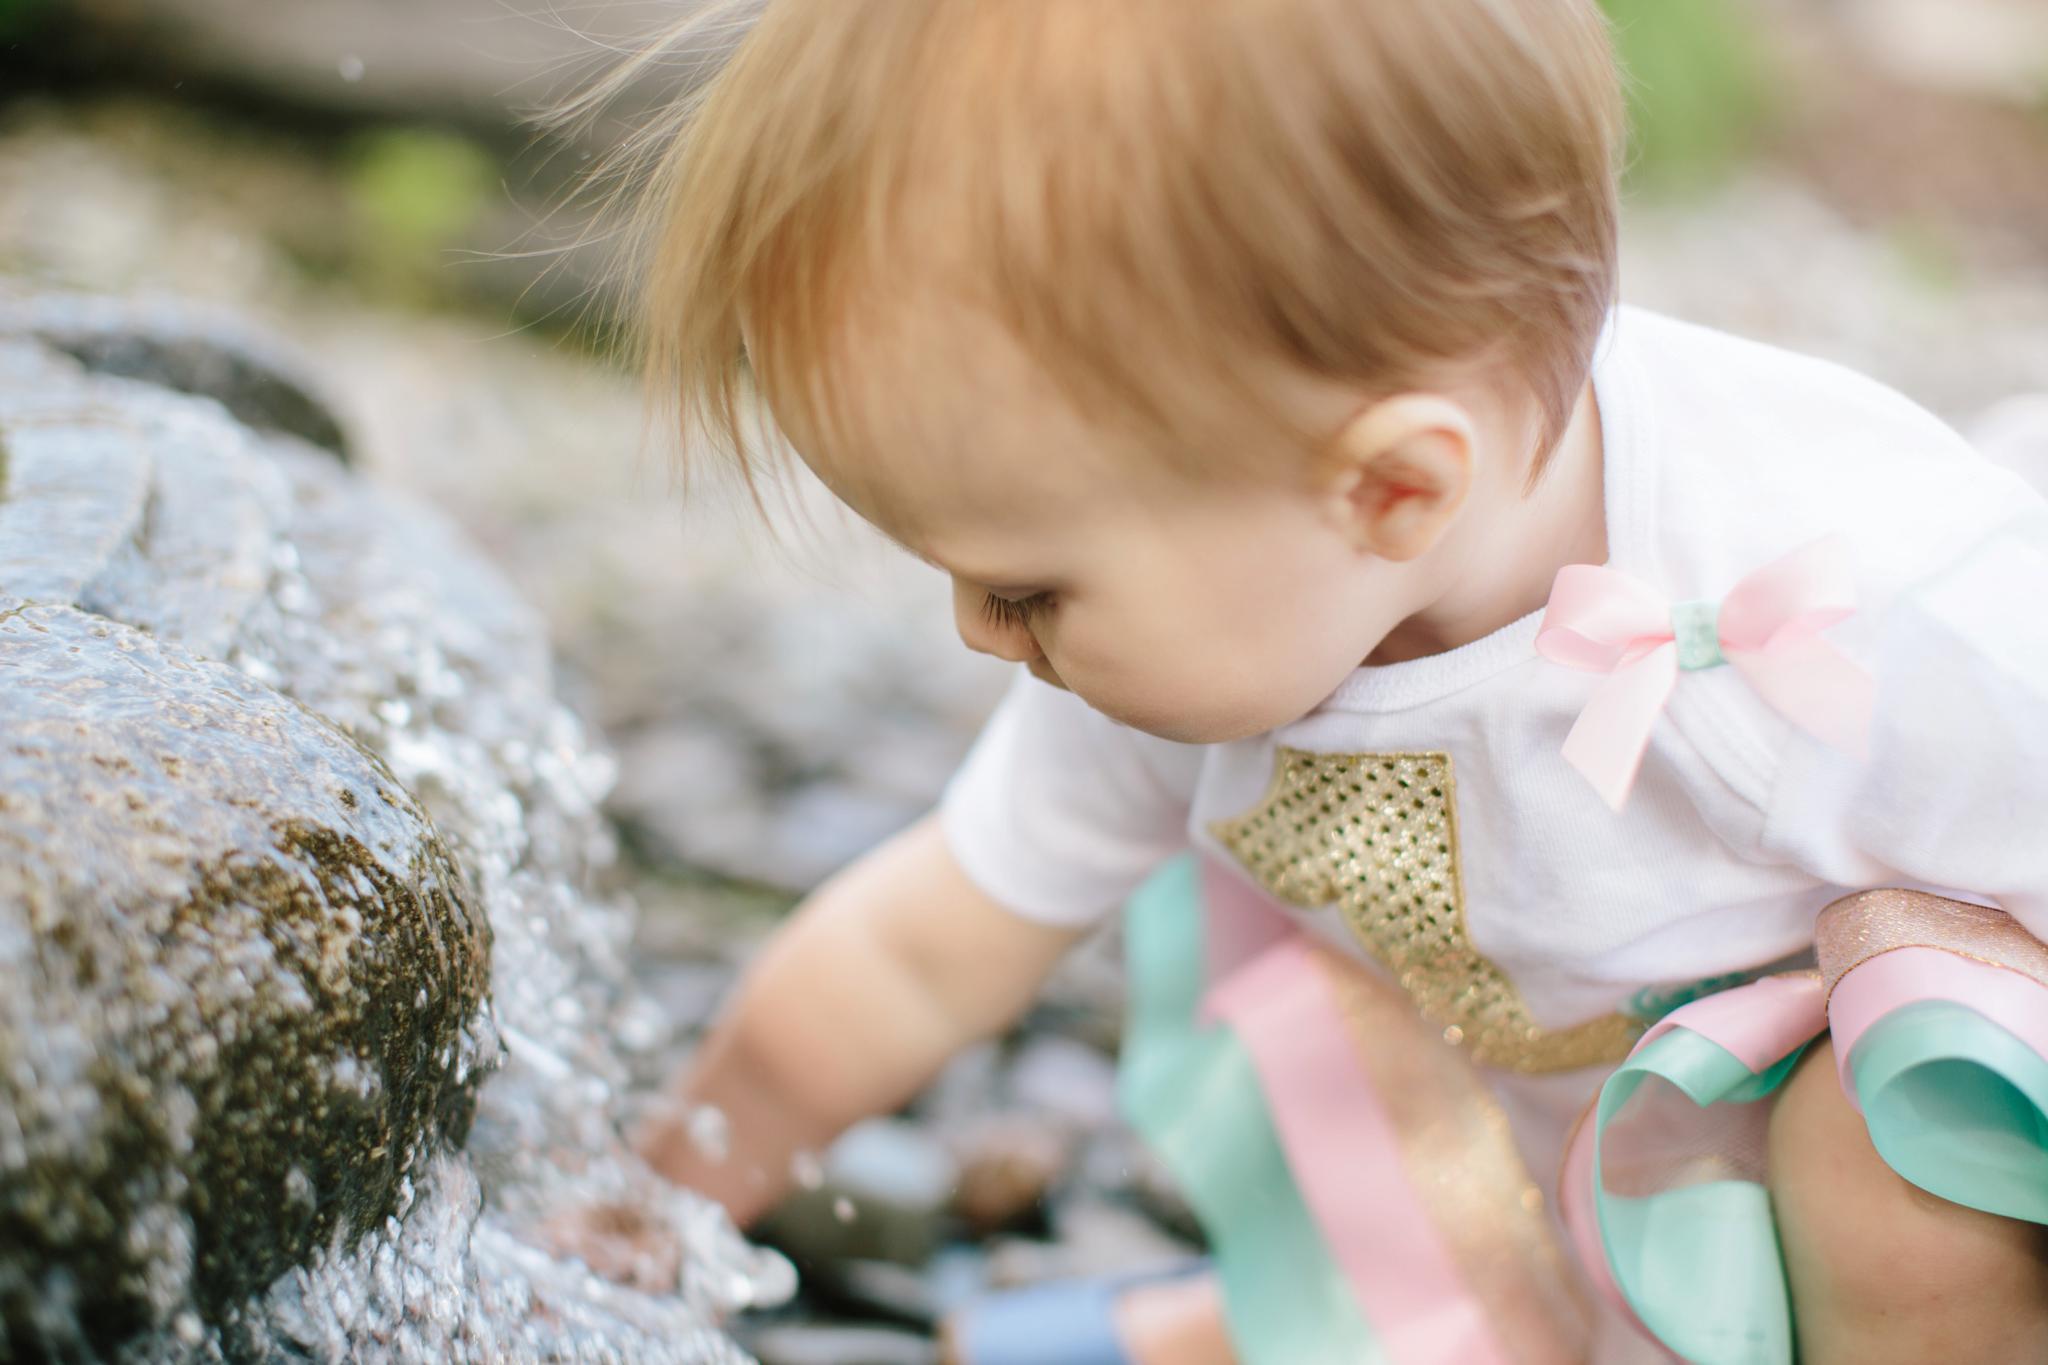 creekside_gardens_baby_portraits_0261.jpg